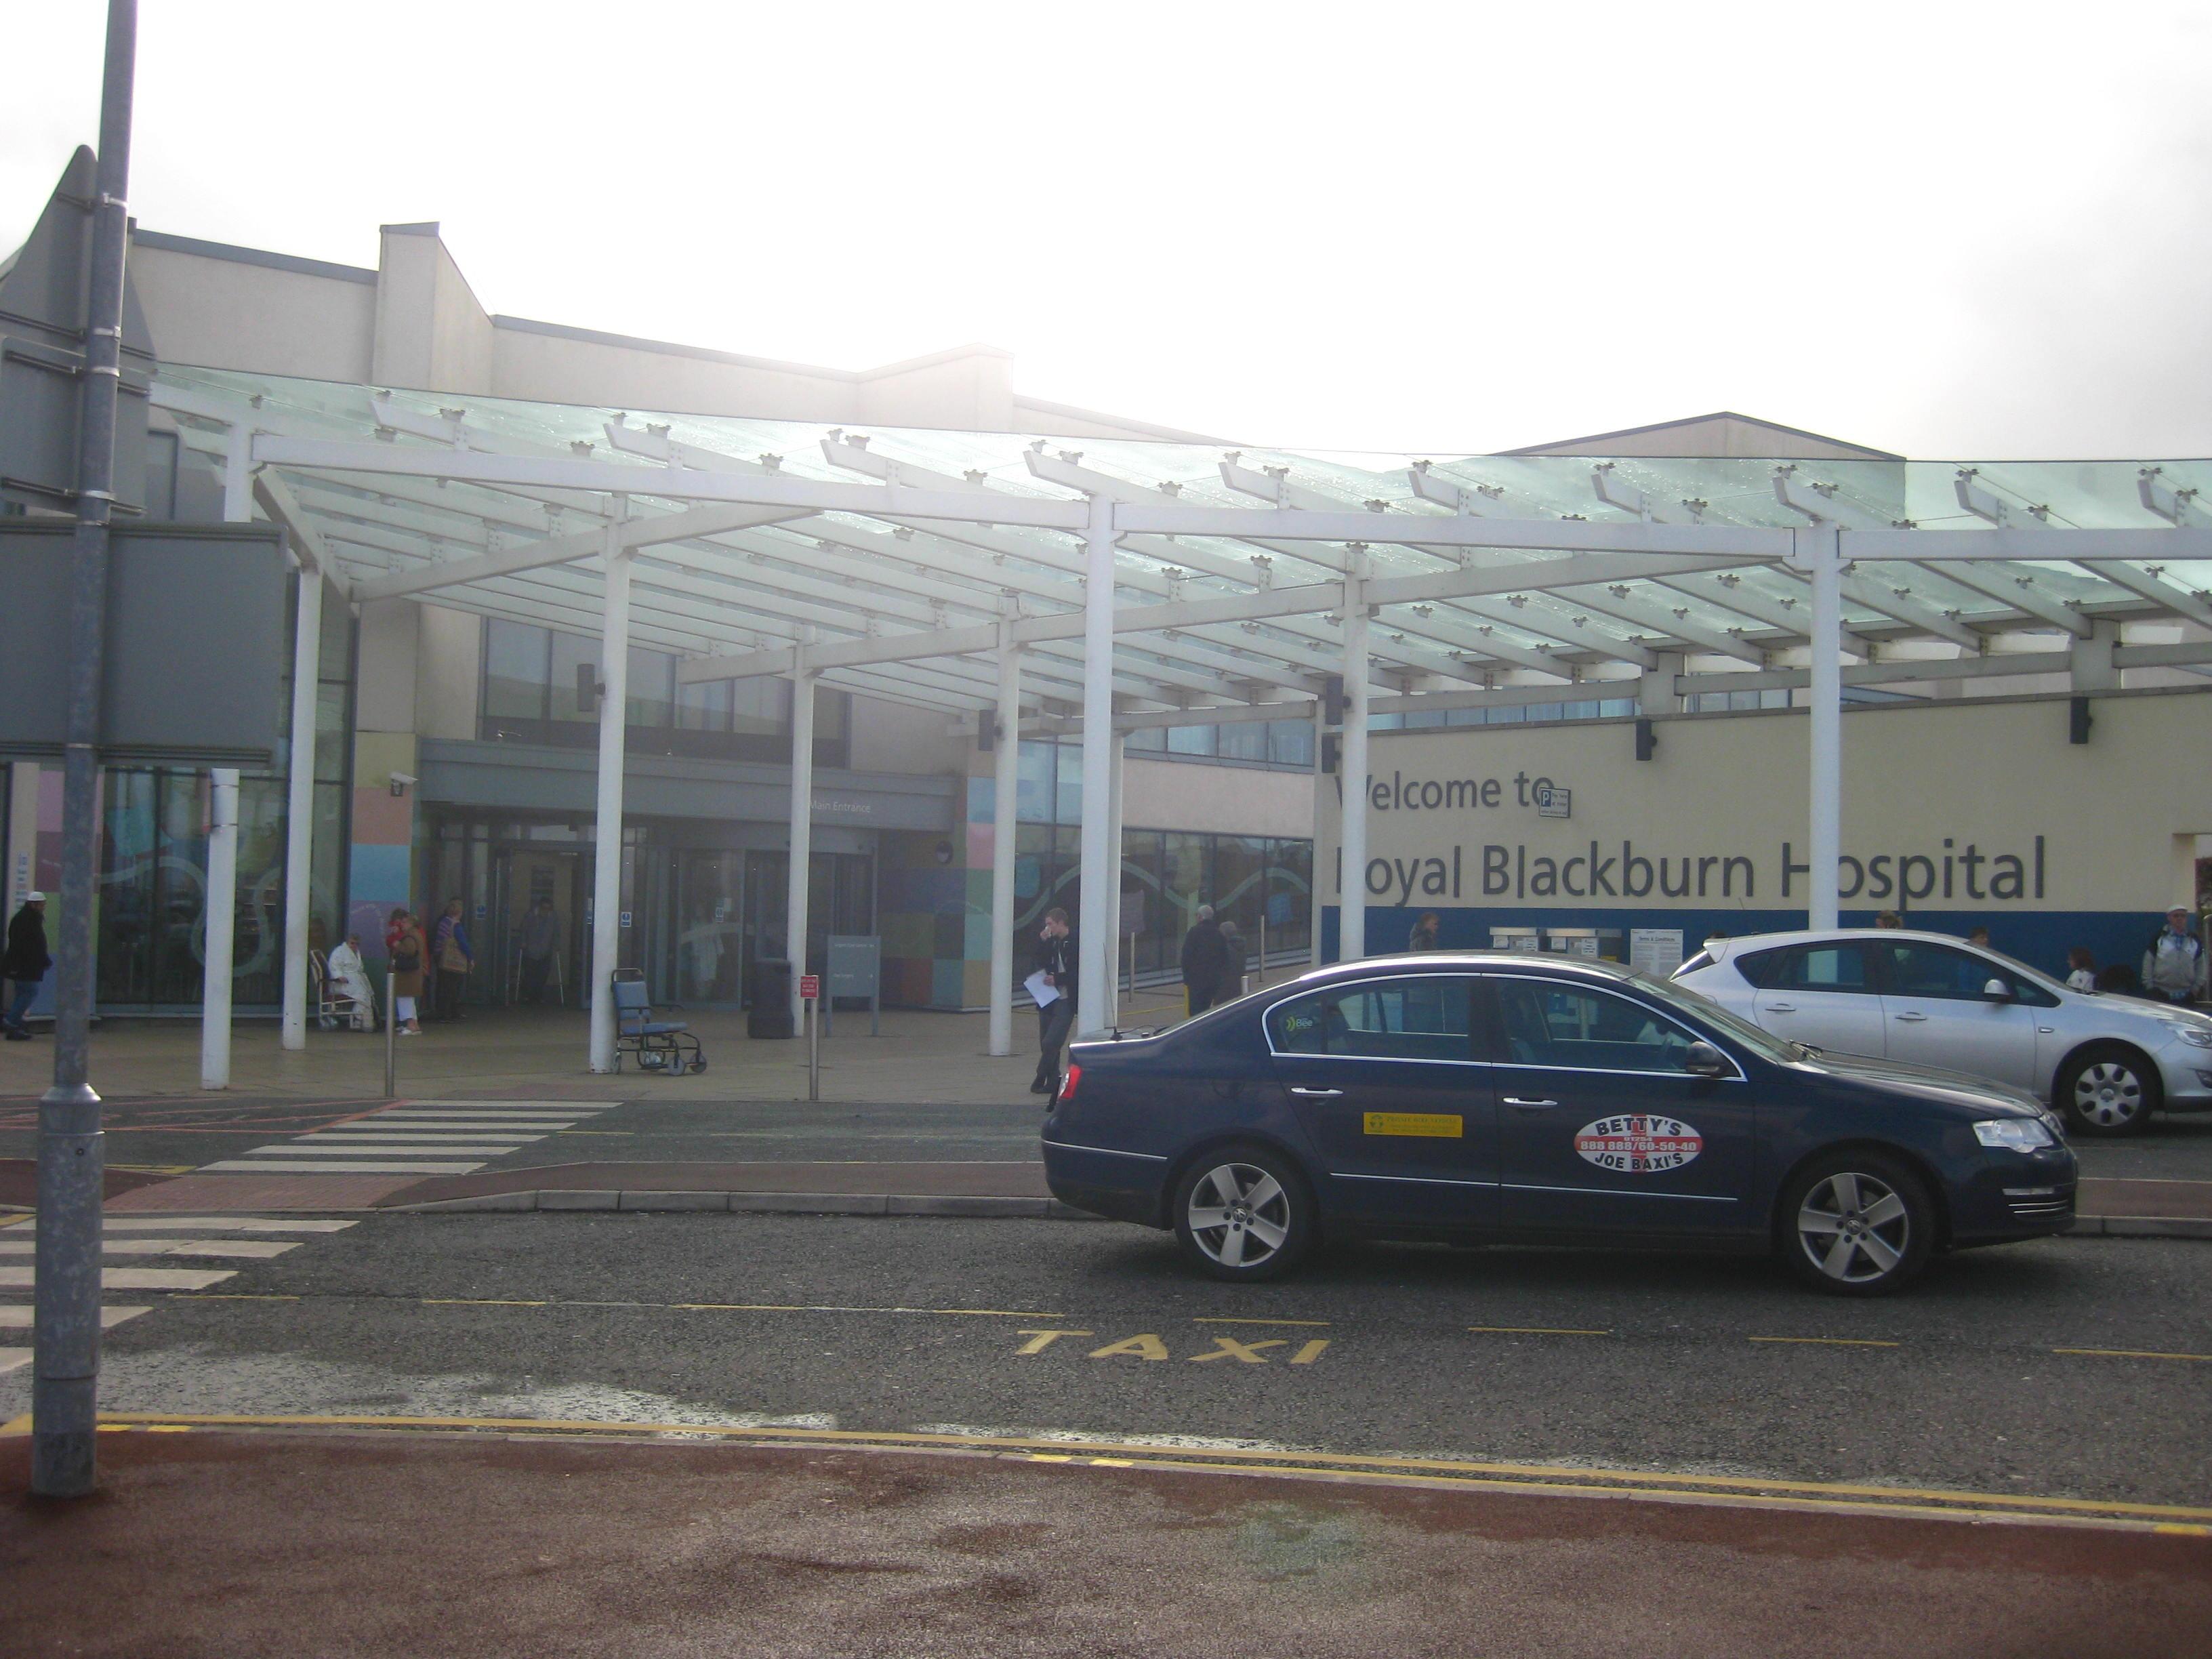 Royal Blackburn Hospital